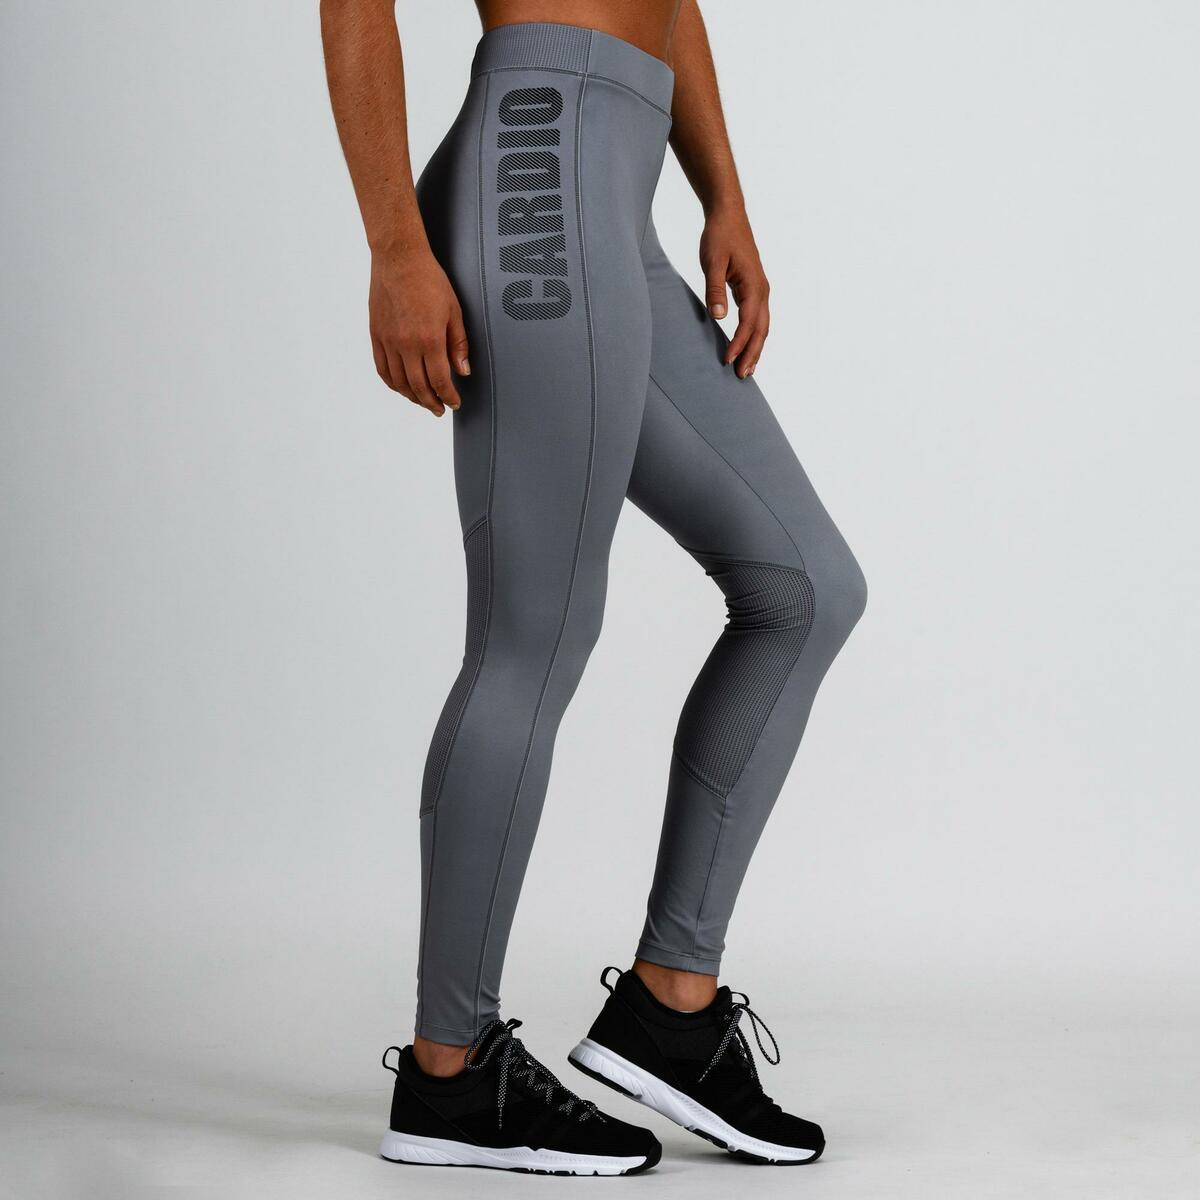 Bild 2 von Leggings FTI 120 Fitness Cardio Damen grau